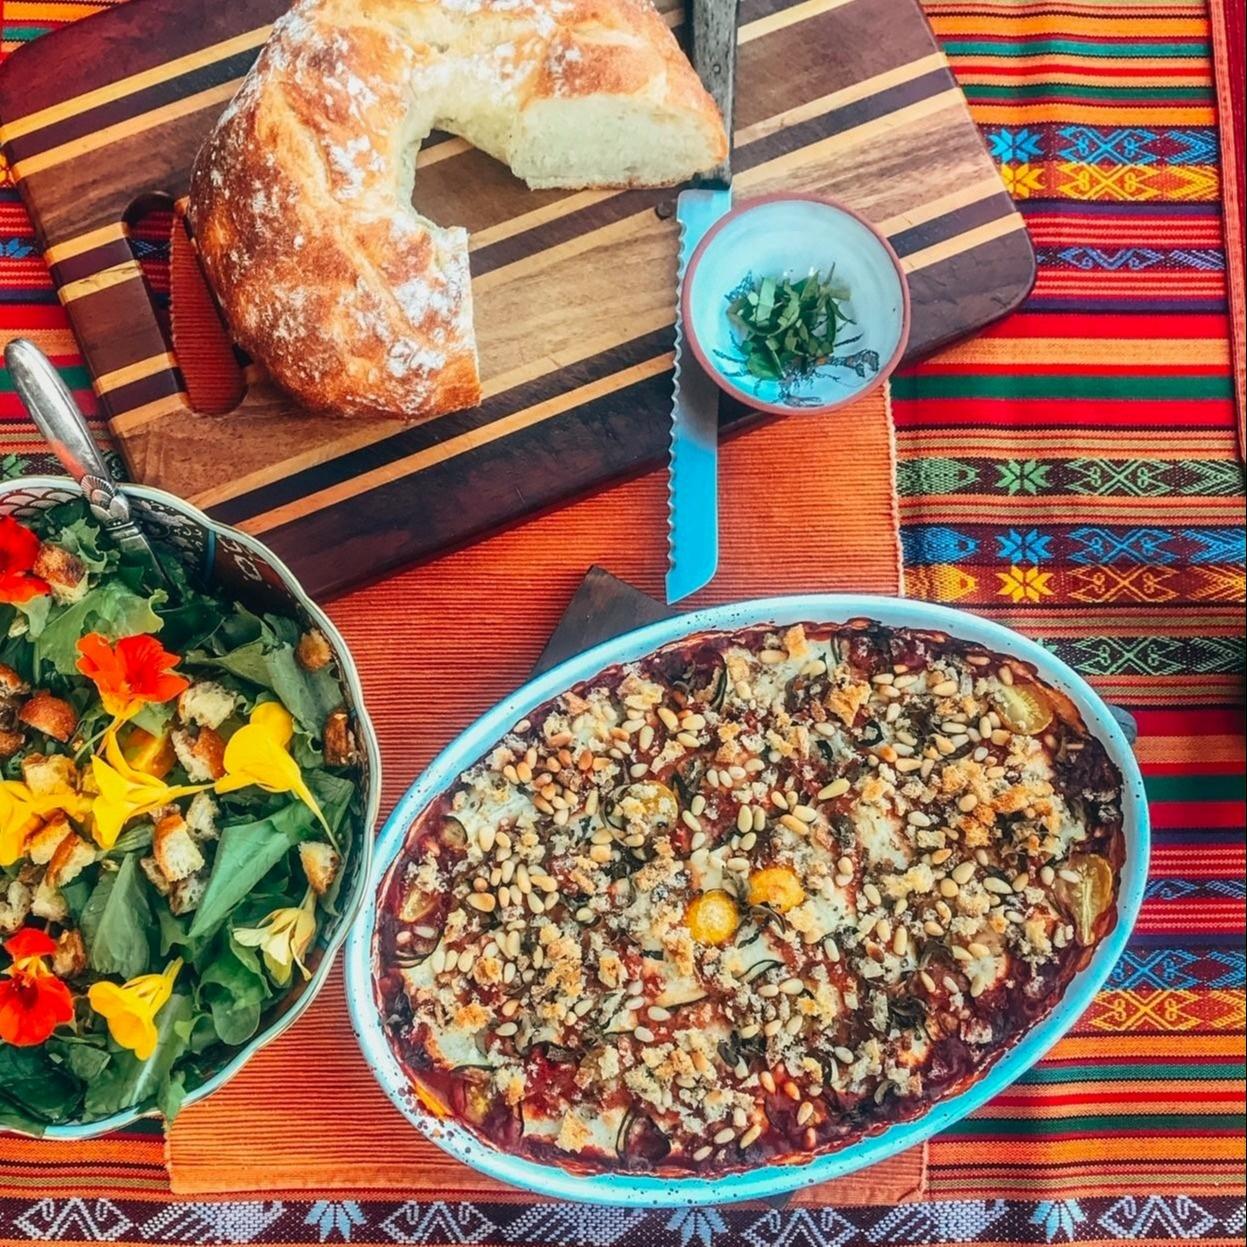 birds eye view of salad, bread and vegan involtini